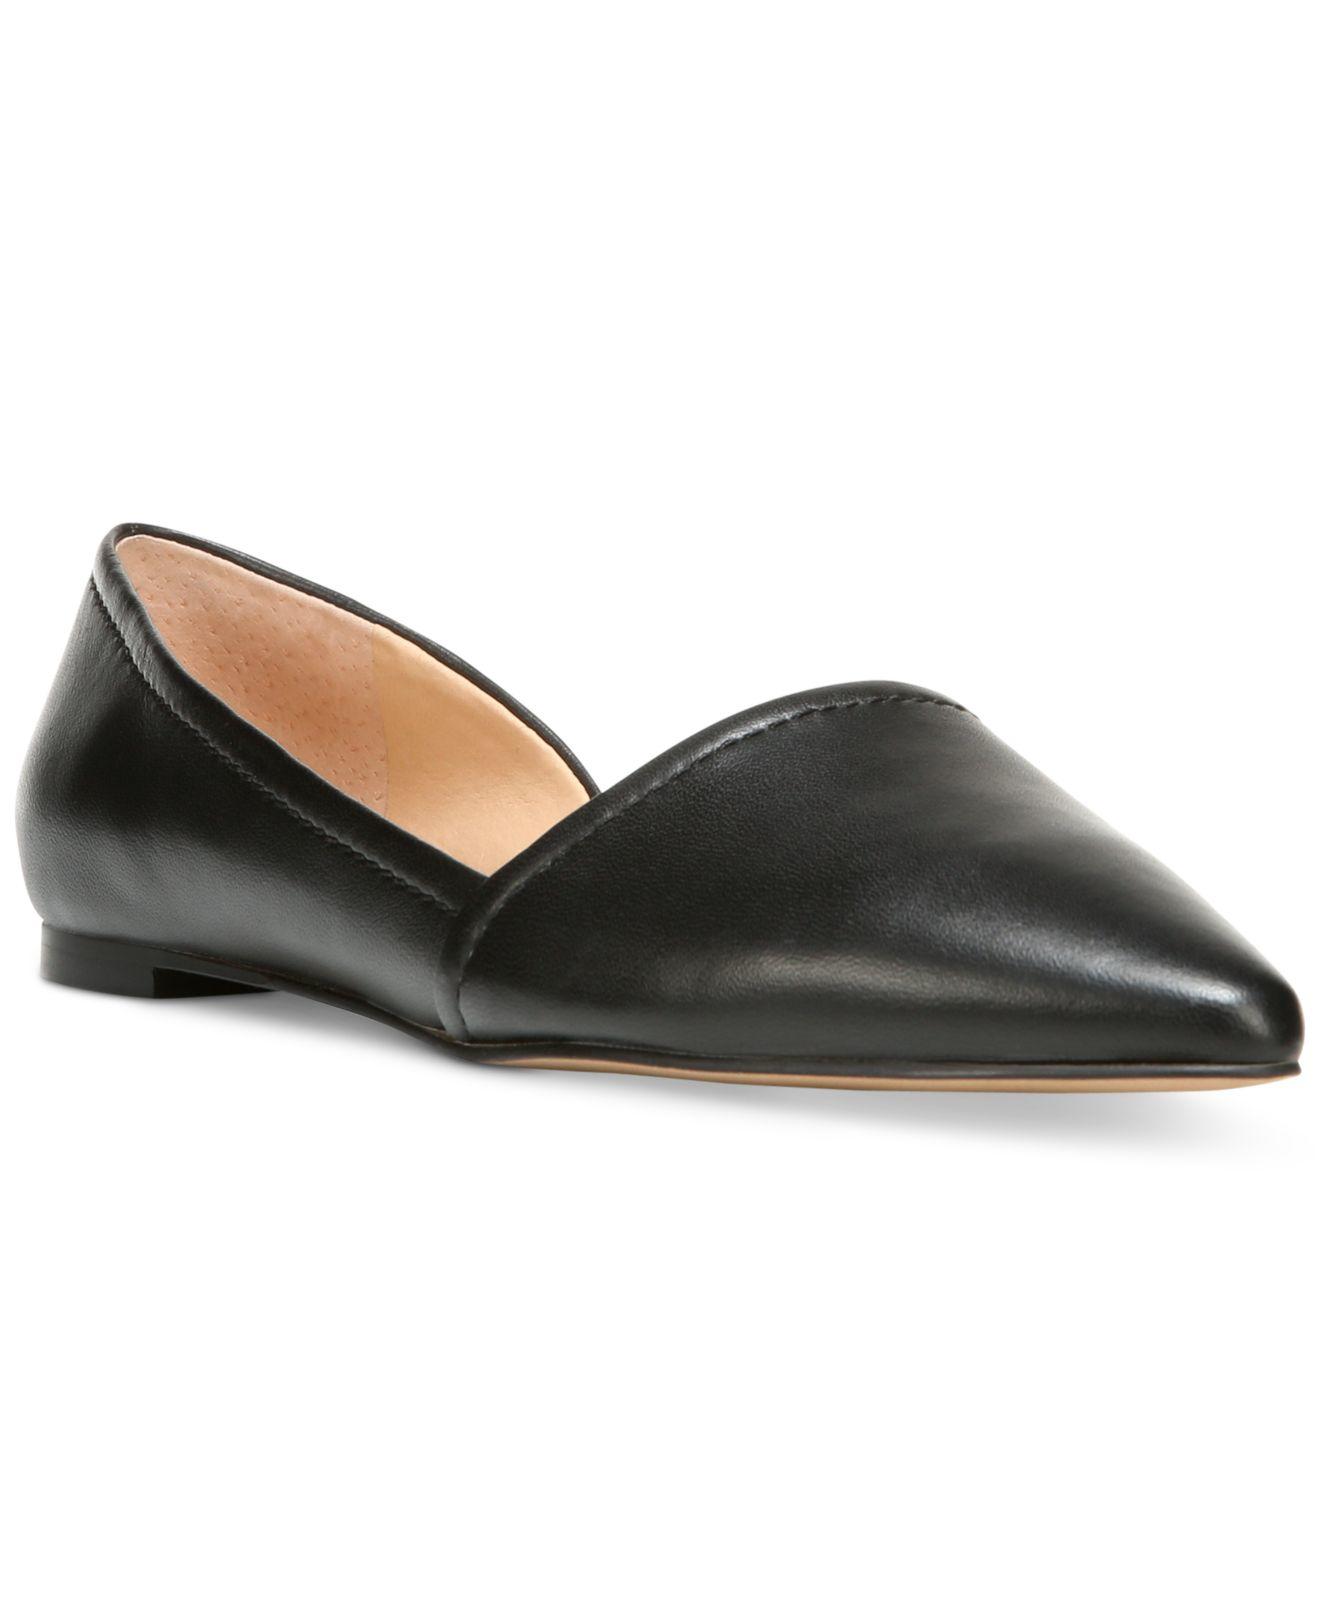 Franco sarto Spiral Pointed-toe Flats in Black